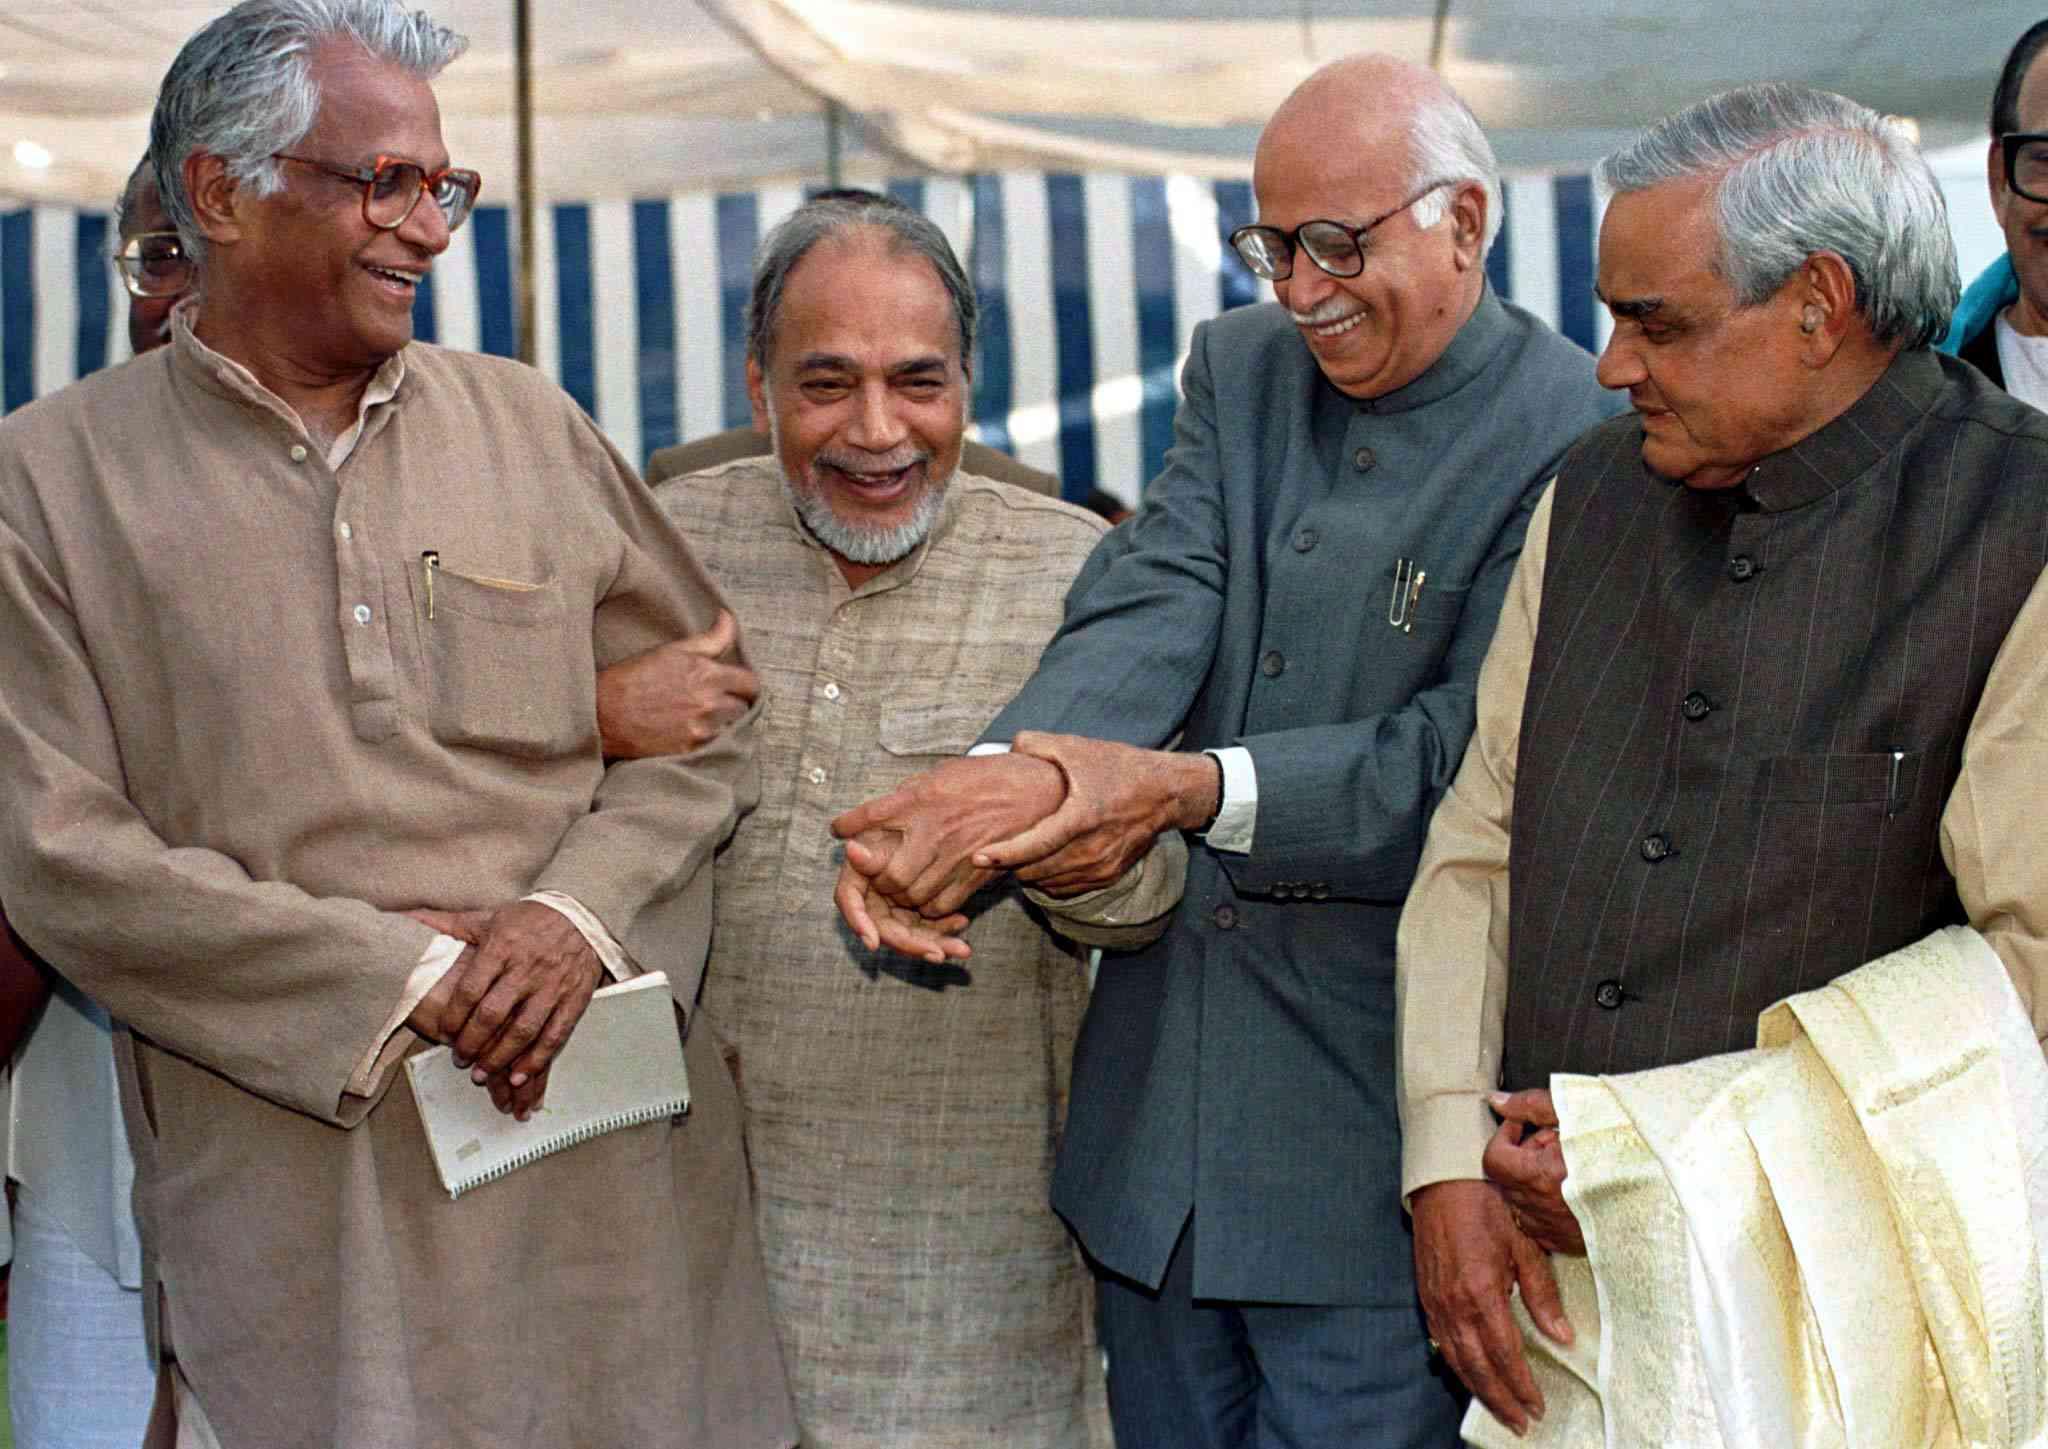 George Fernandes with Ramakrishna Hegde, LK Advani and Atal Bihari Vajpayee. Photo credit: Reuters